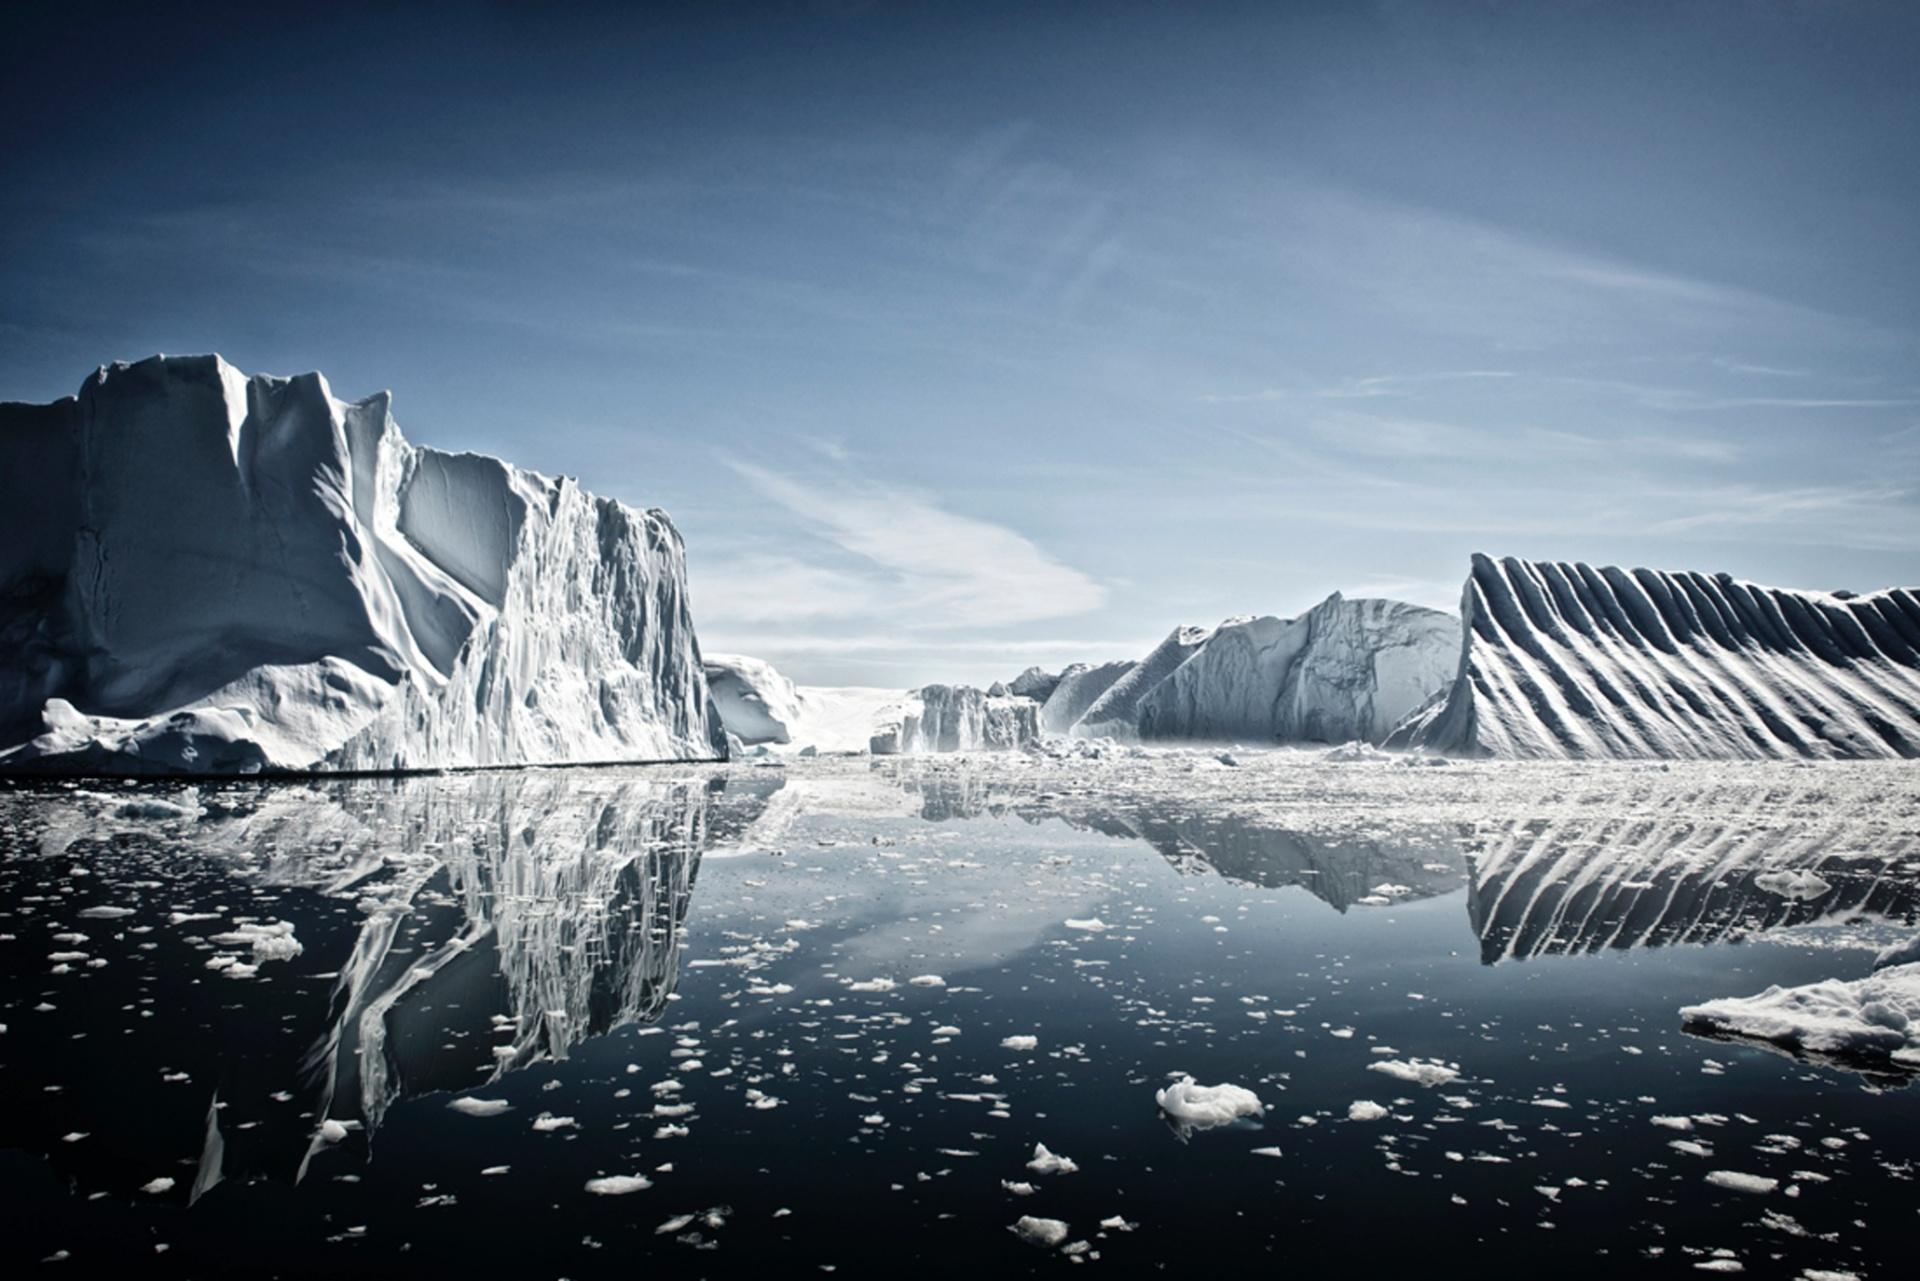 Earth, Air, Fire, Water, commended, Nicolas Lotsos, Greece Disco Bay, Greenland Photograph: Nicolas Lotsos/TPOTY